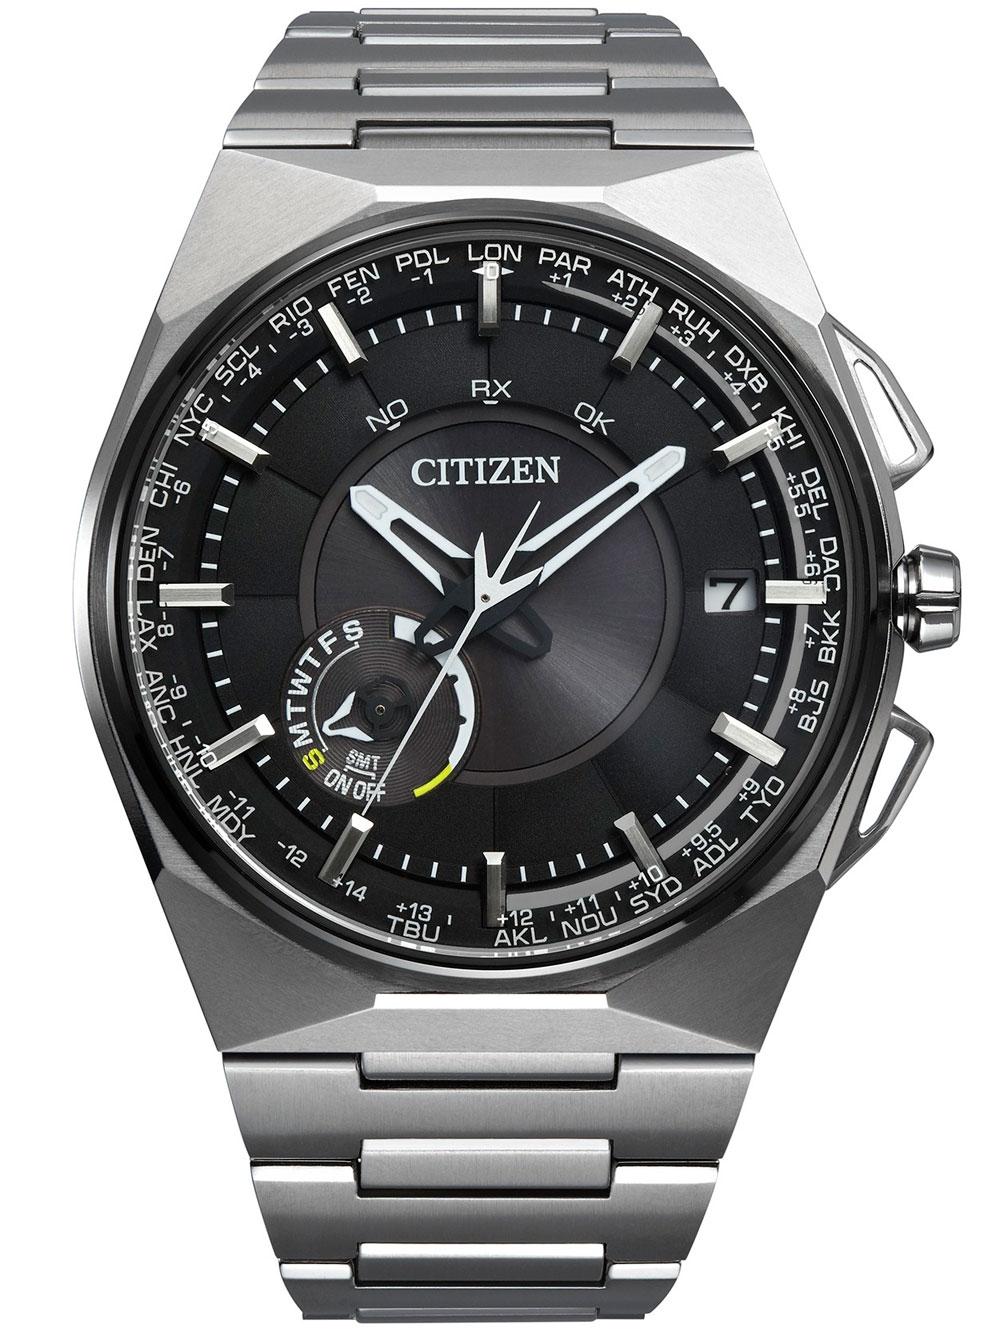 Citizen Eco-Drive Satellite Time System CC2006-53E 48 mm 100M